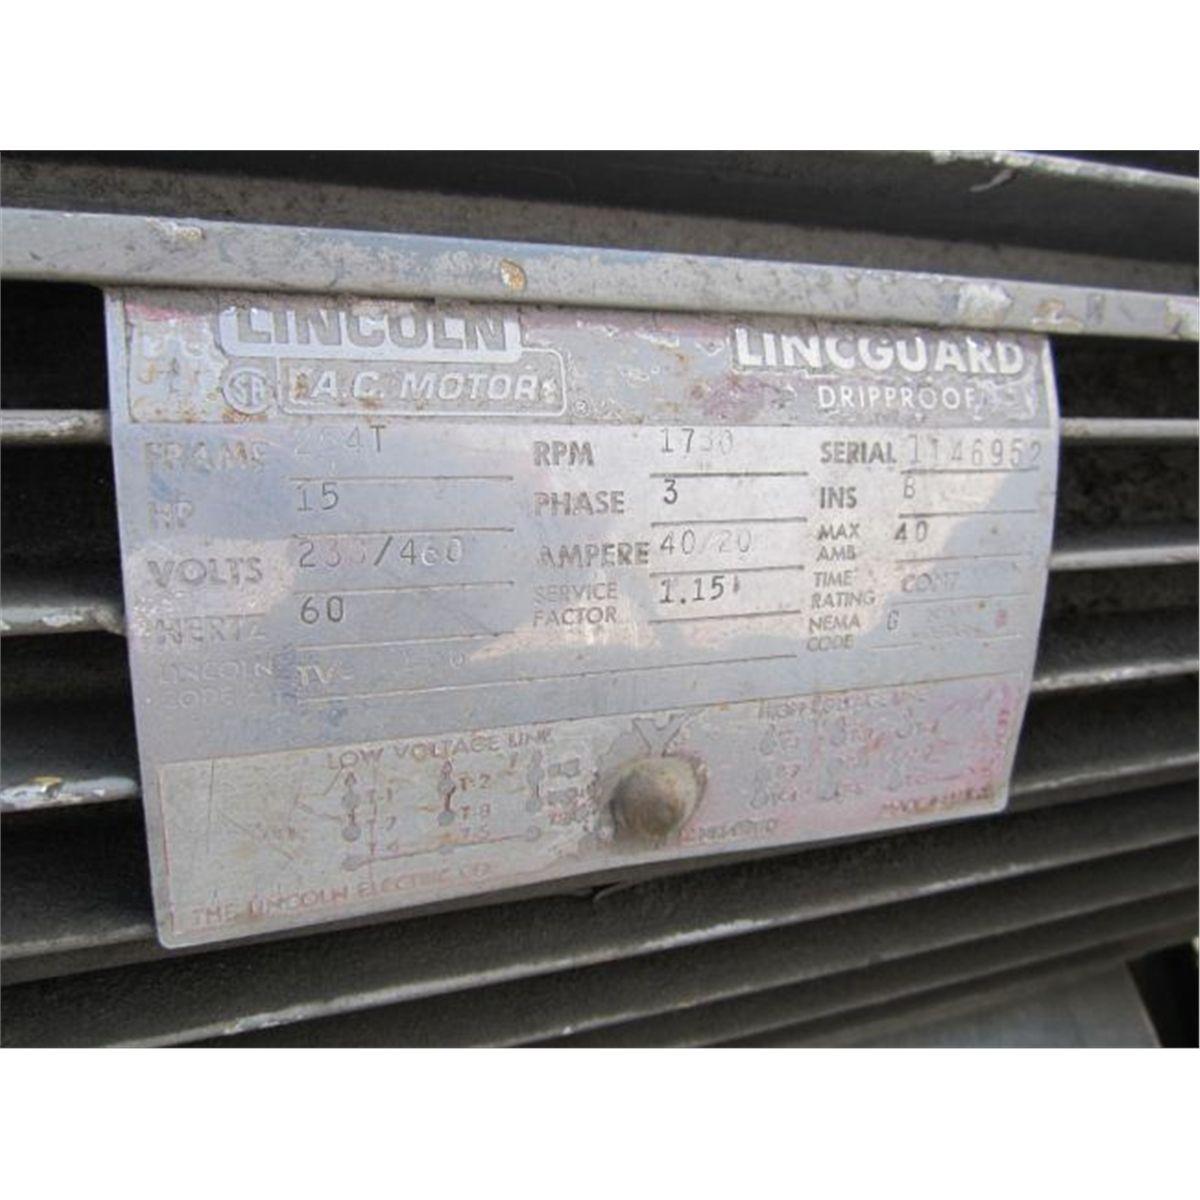 Worthington Horizontal 125 PSI Air Compressor